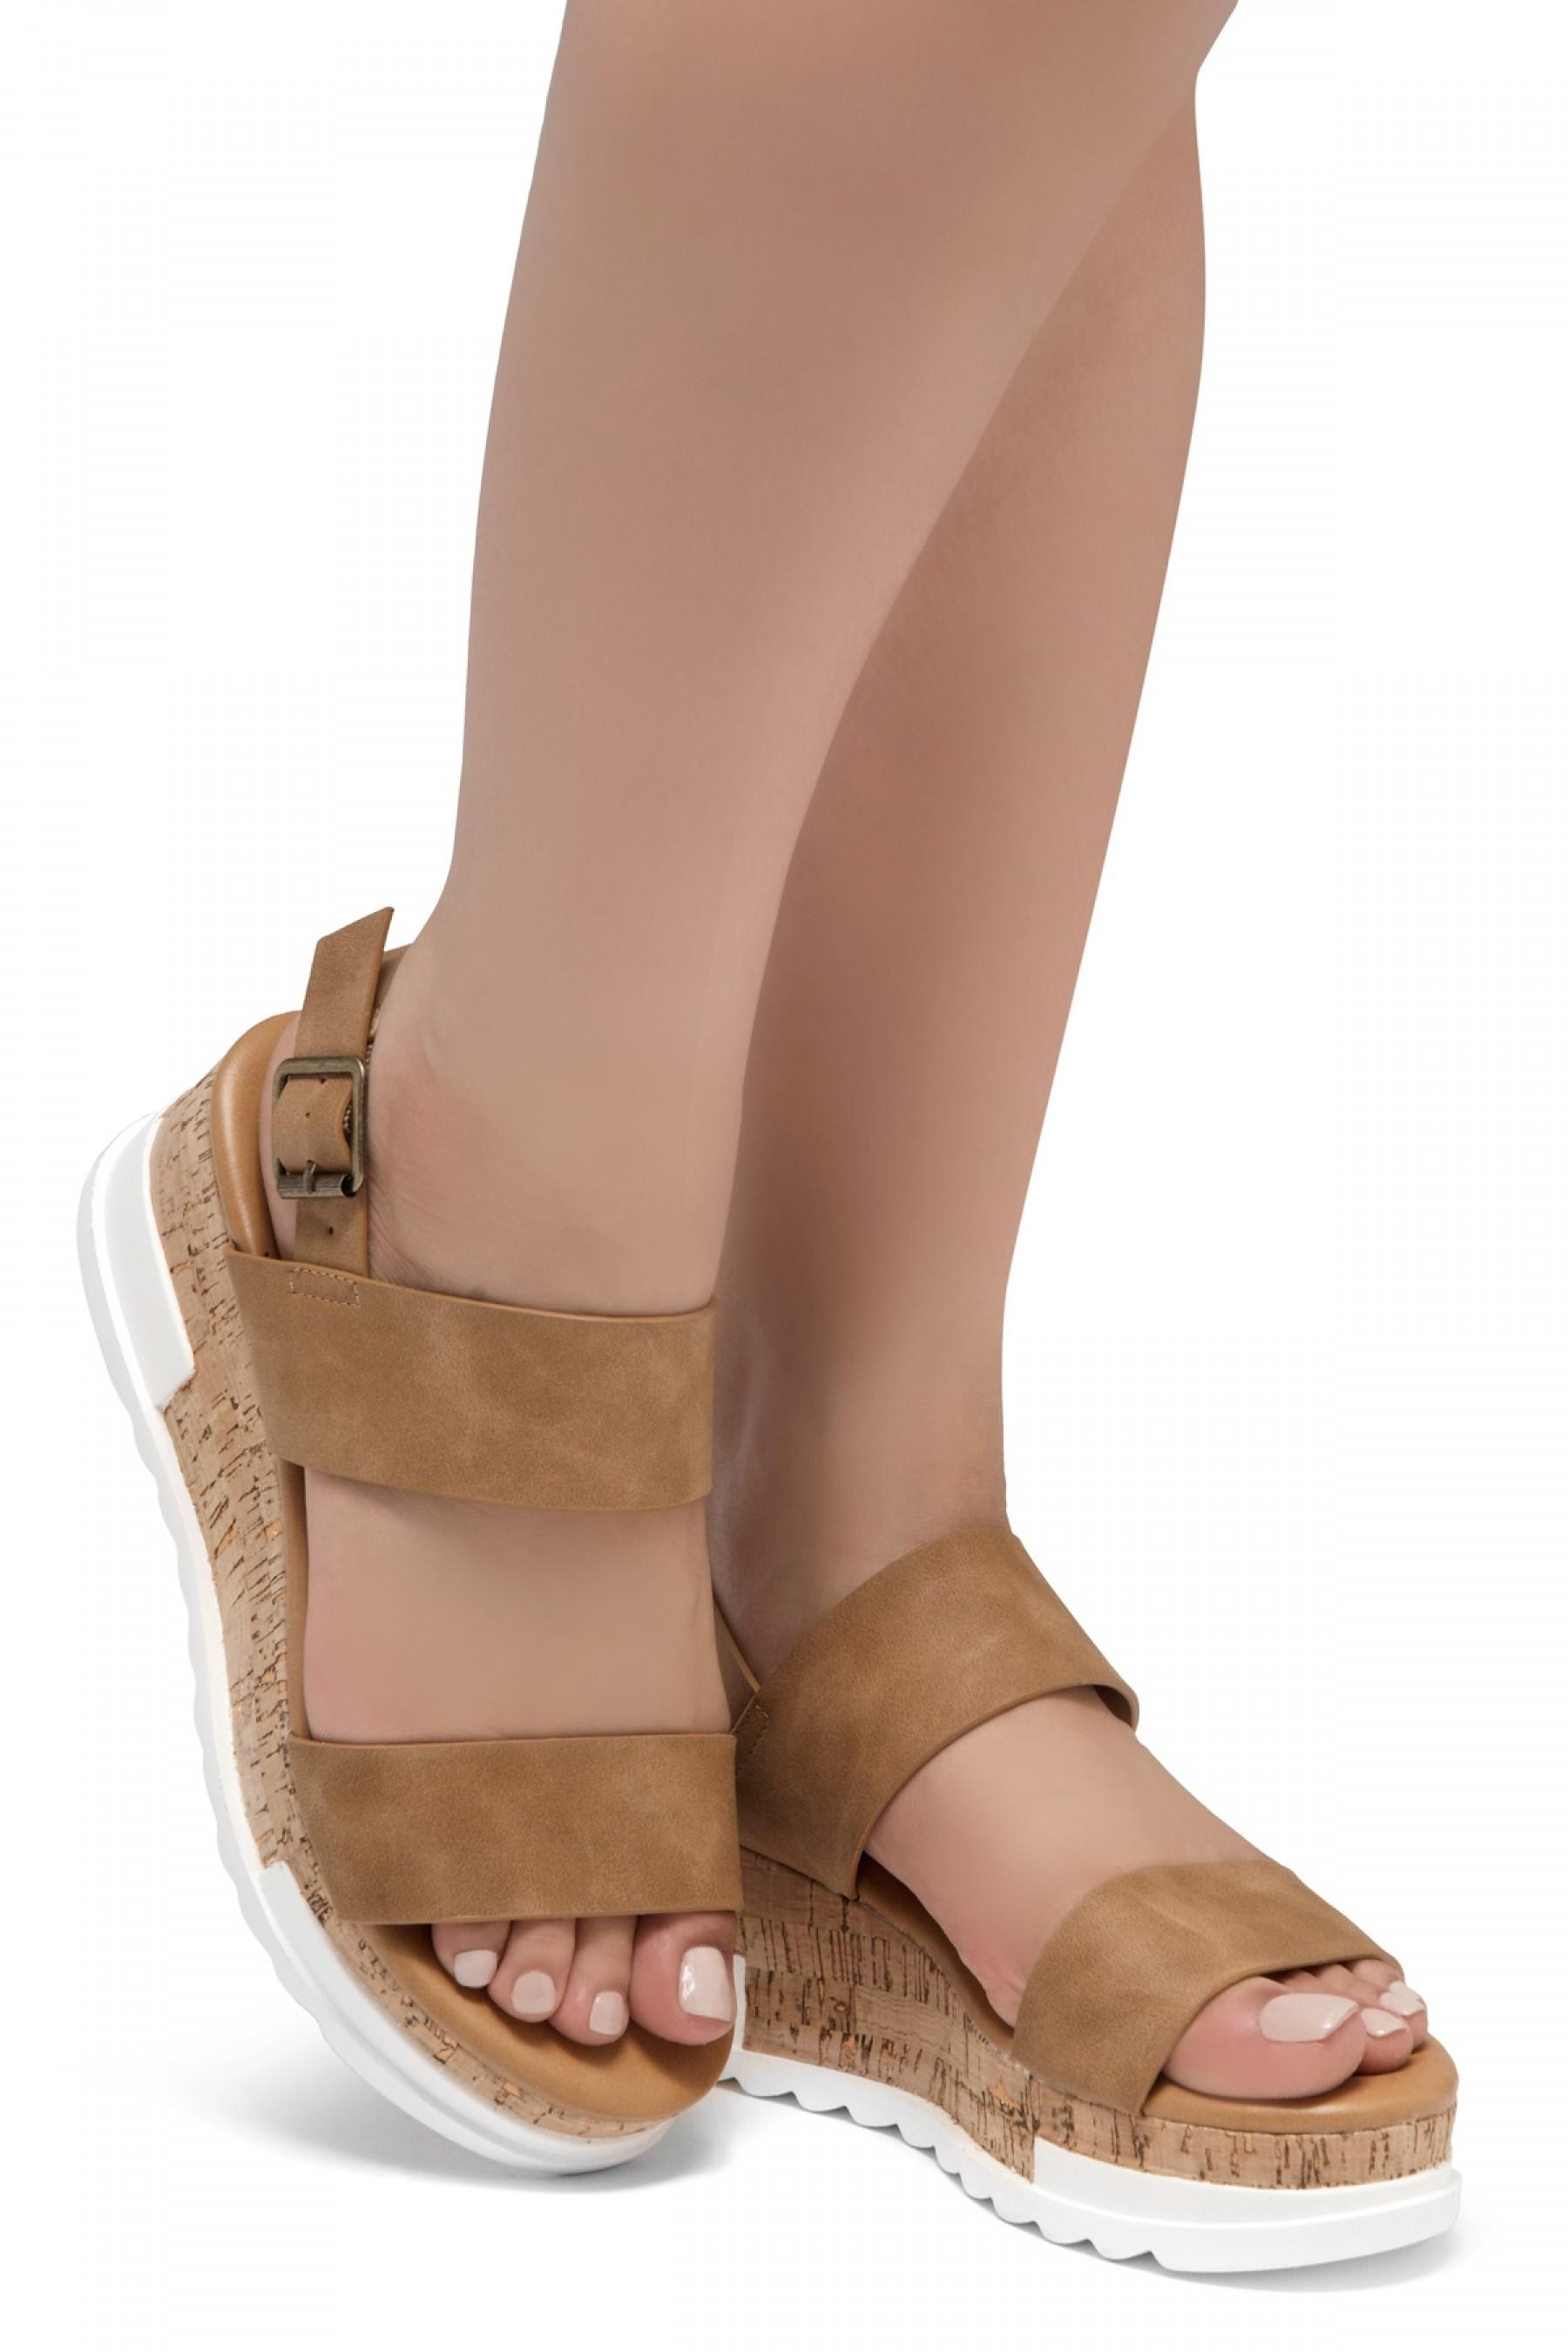 ShoeLand DIRASSA-Women's Open Toe Ankle Strap Platform Wedge Sandals(Tan)